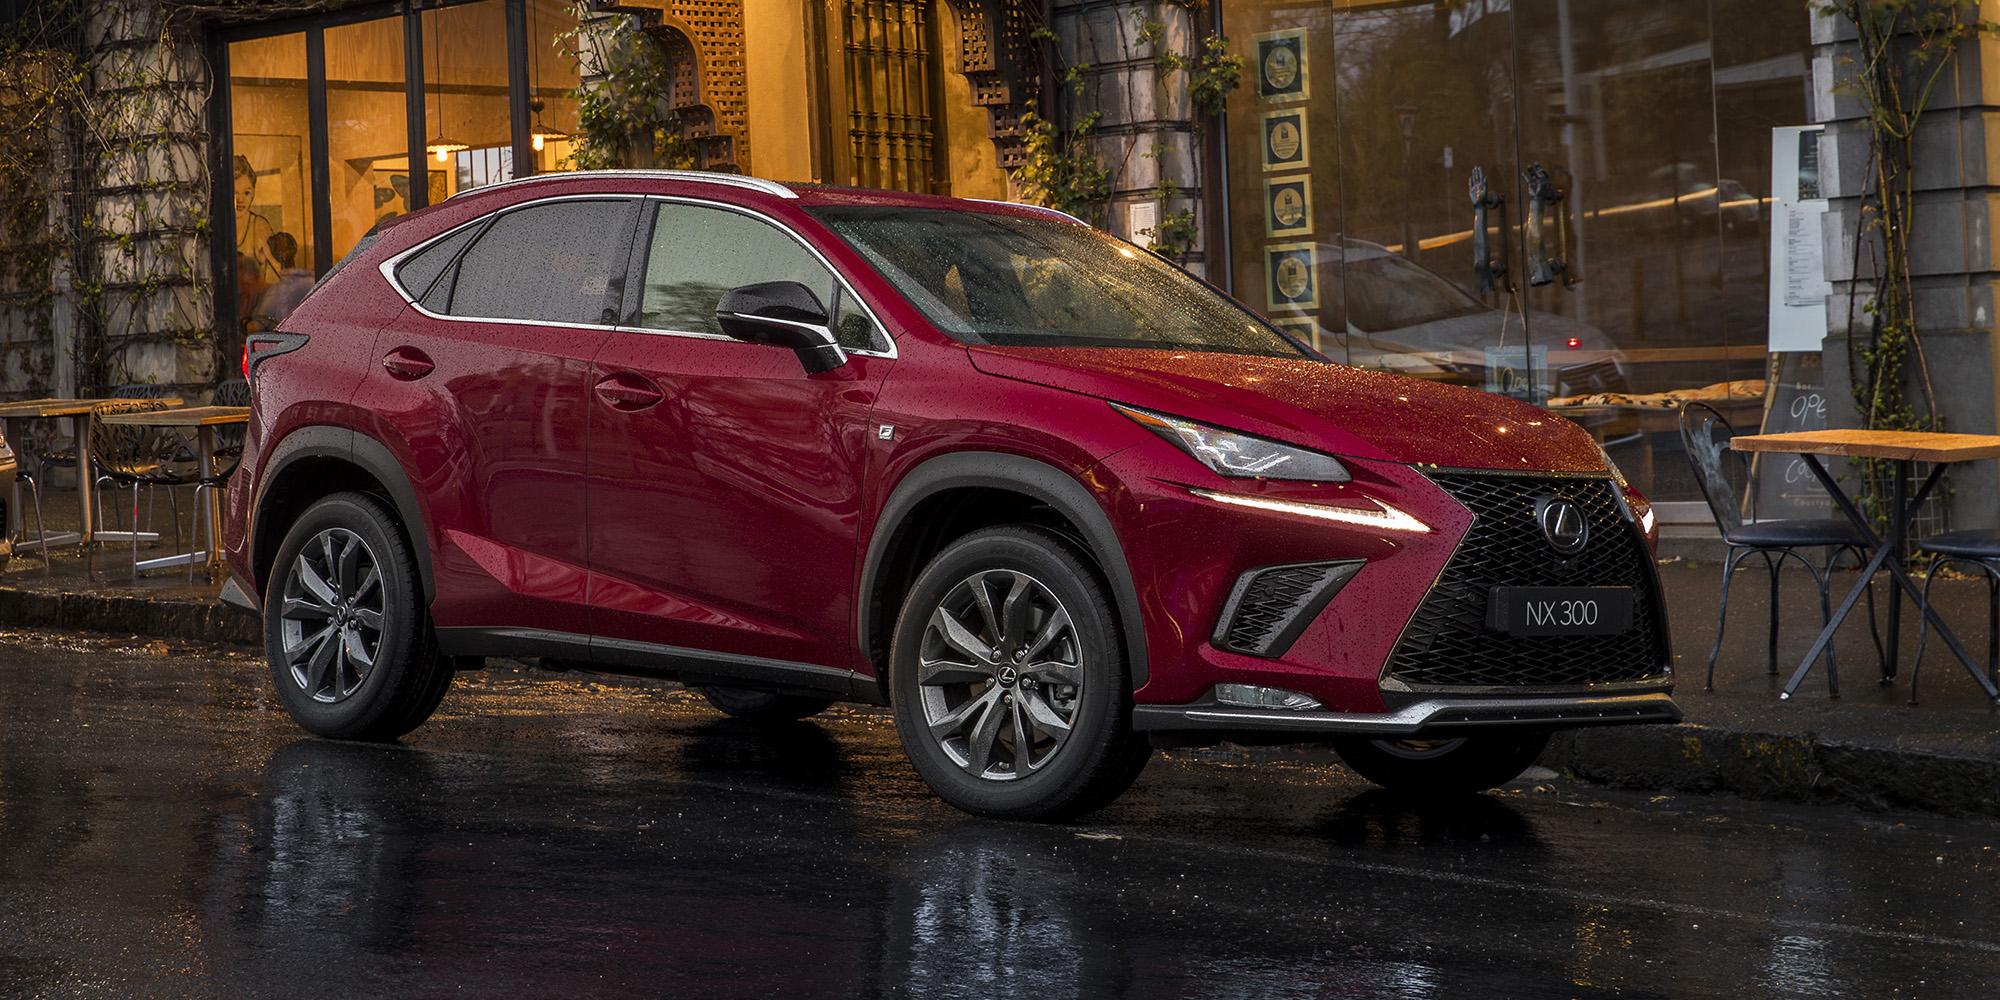 2018 Lexus NX pricing and specs - Photos (1 of 38)